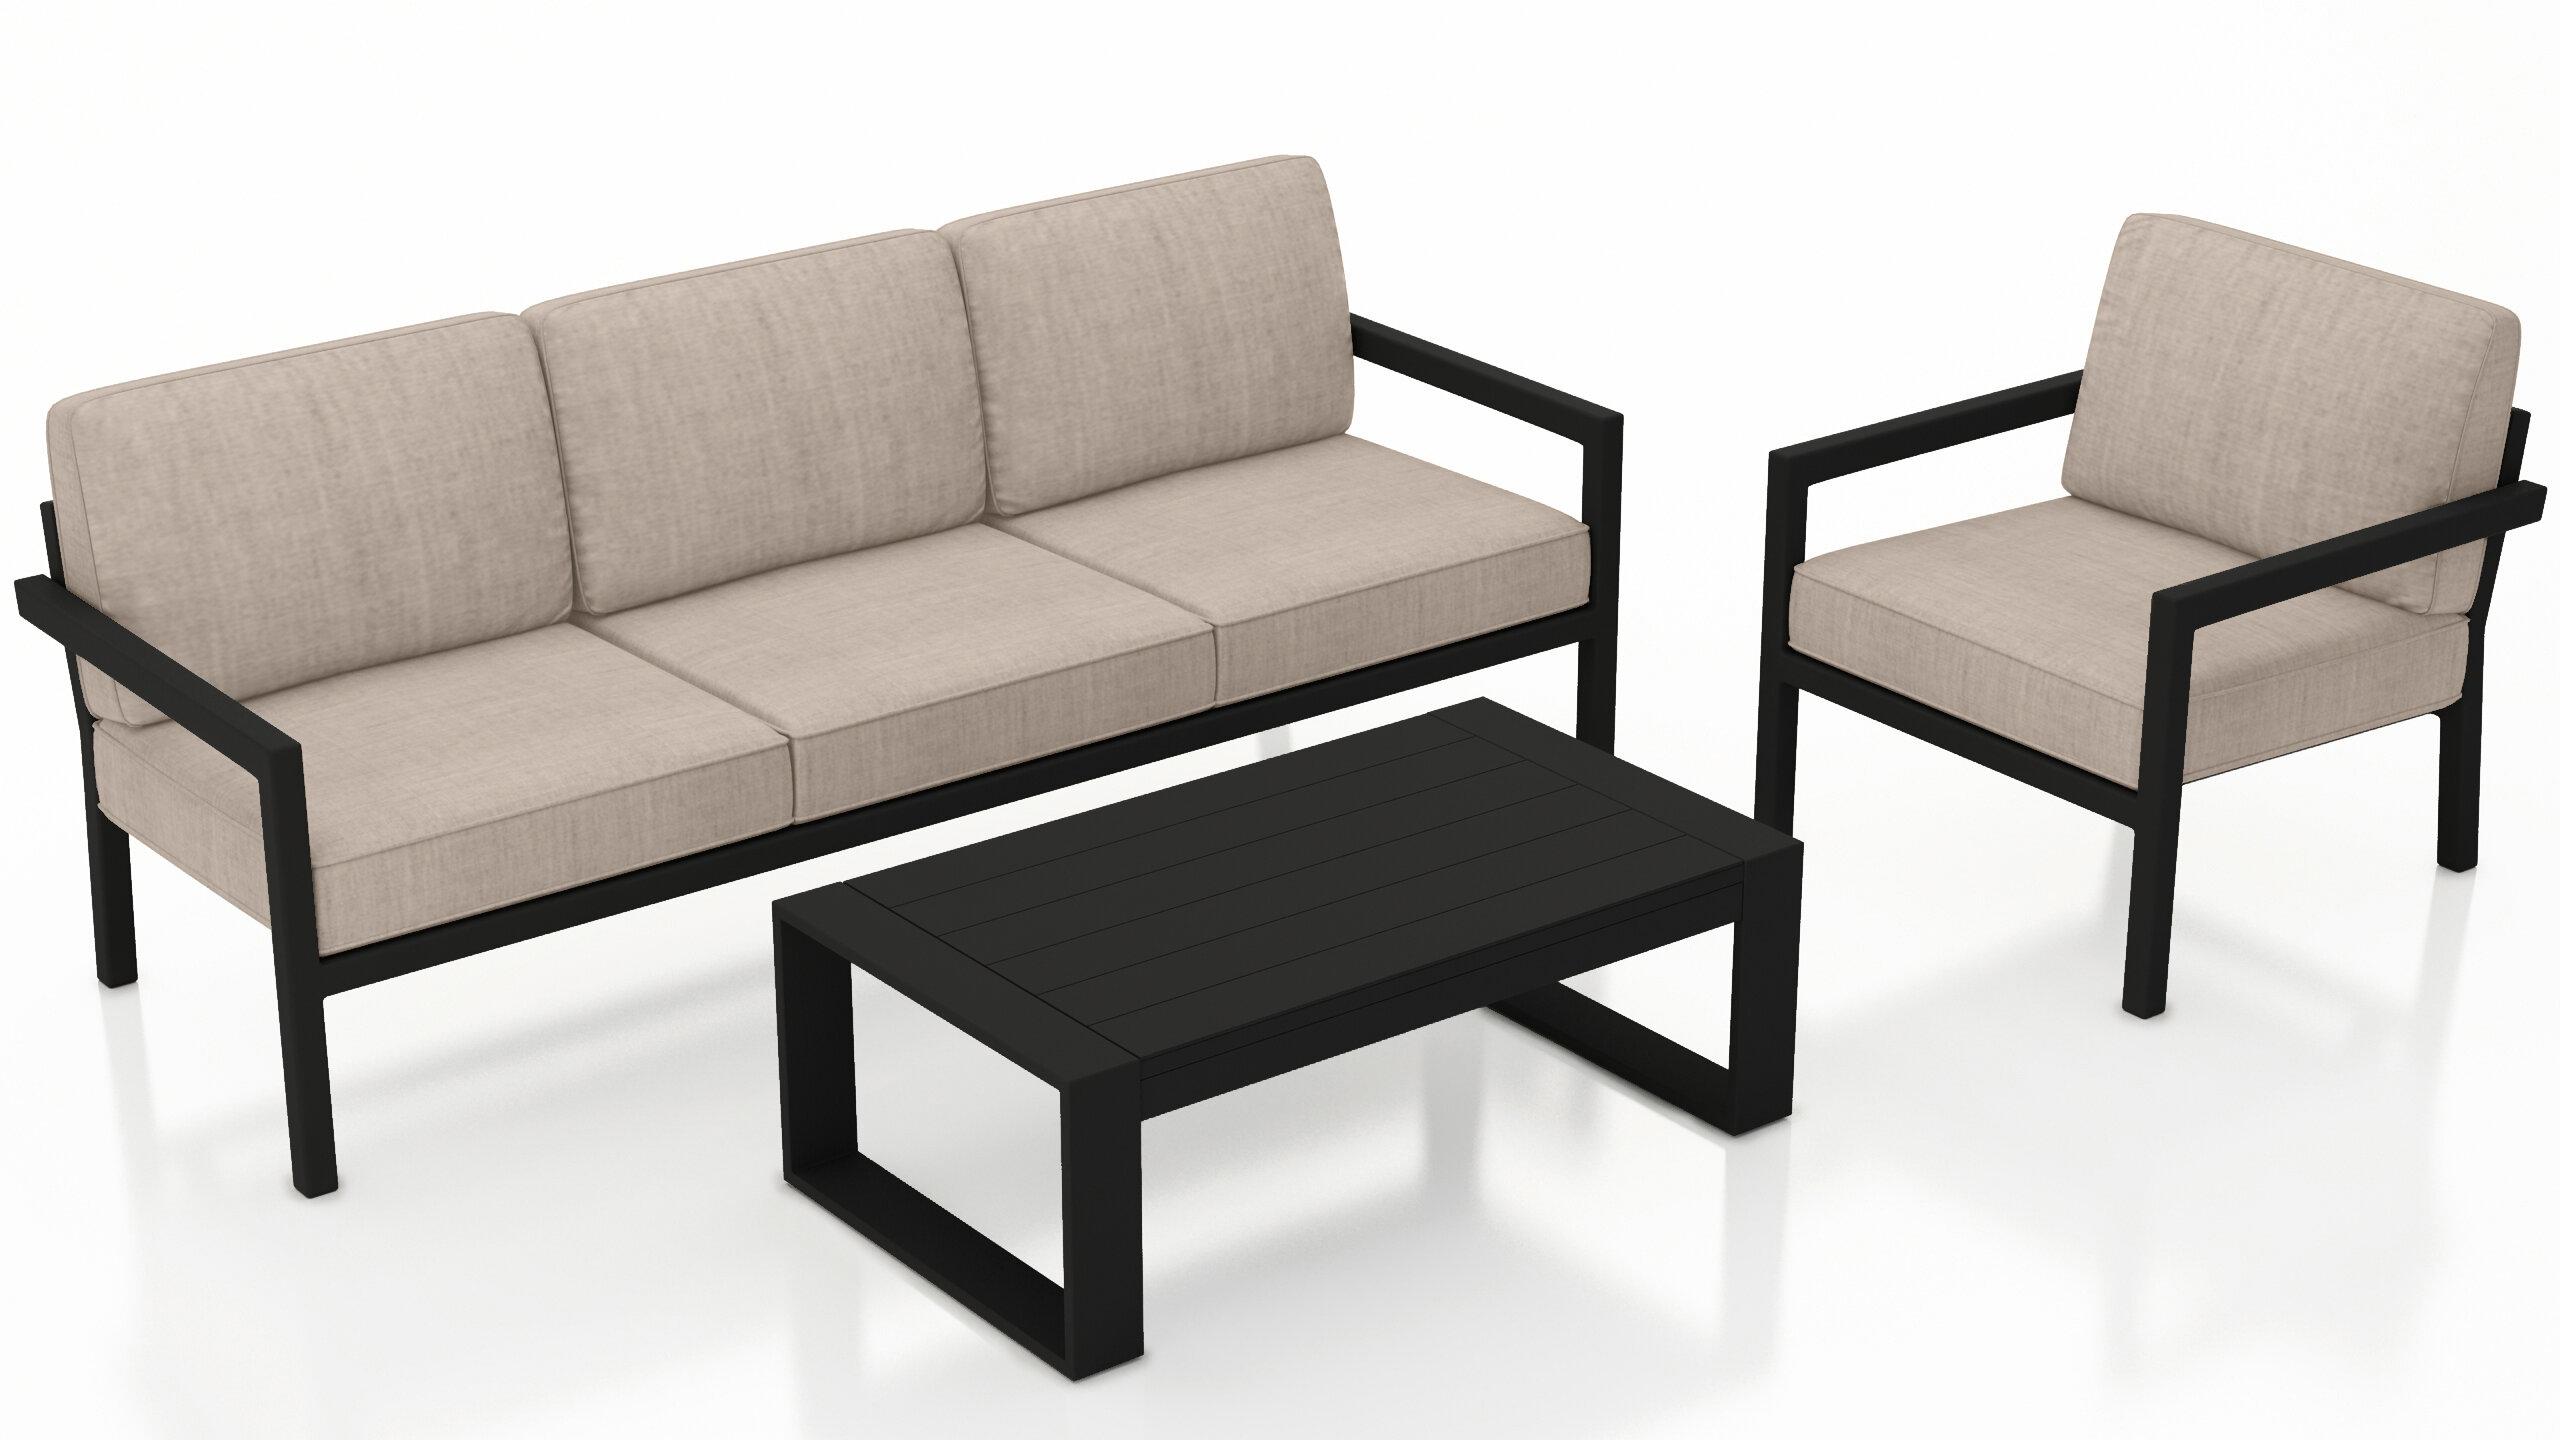 Fabulous Iliana 3 Piece Sofa With Sunbrella Cushions Andrewgaddart Wooden Chair Designs For Living Room Andrewgaddartcom